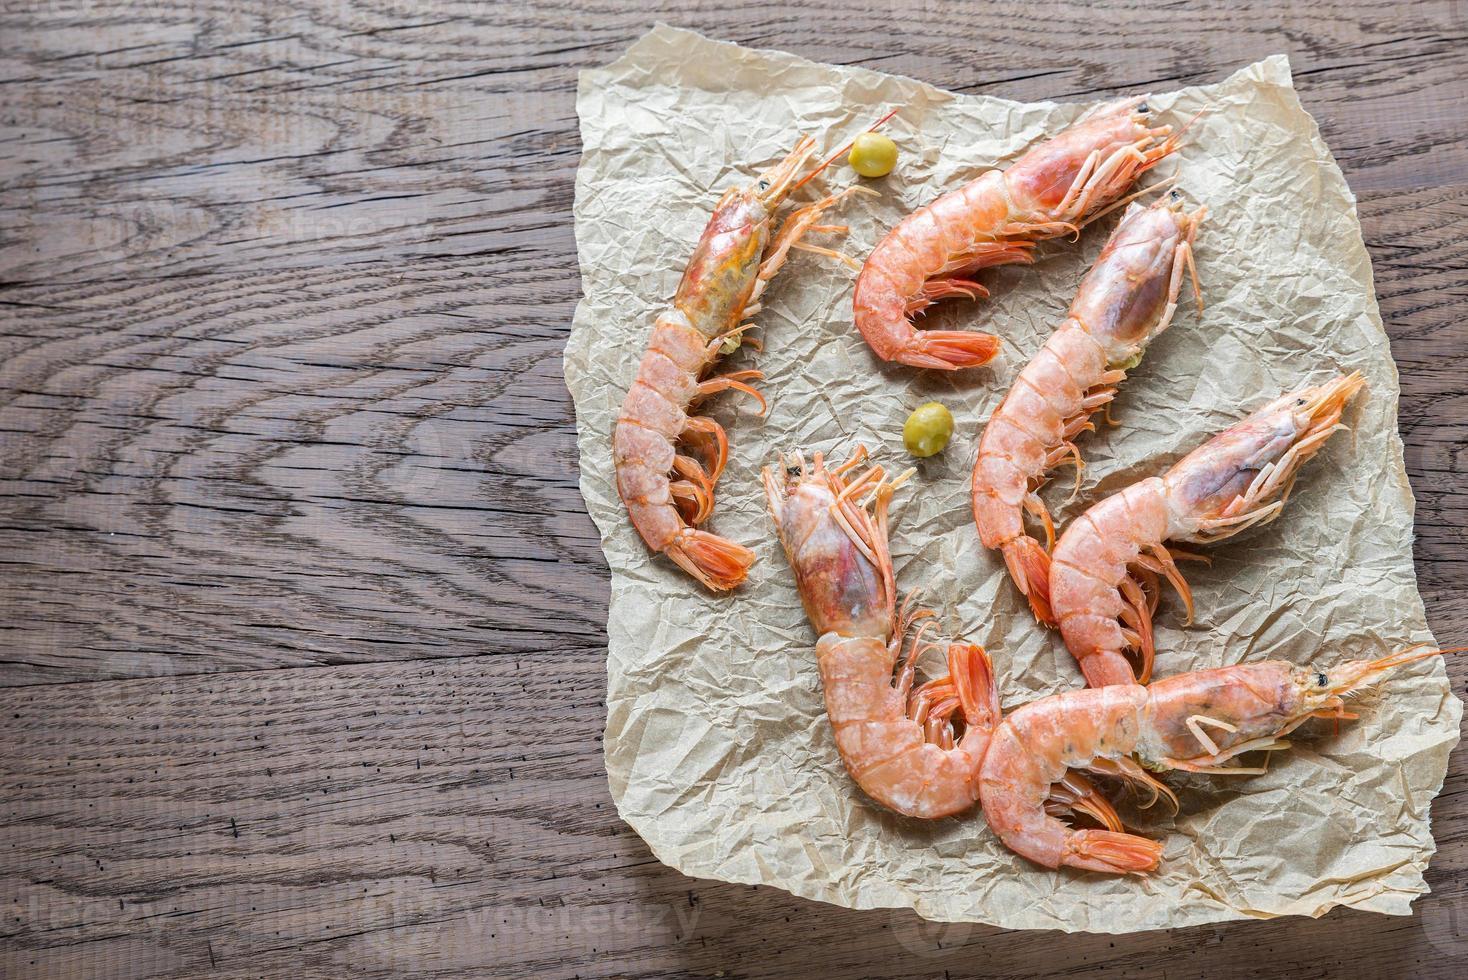 crevettes crues photo